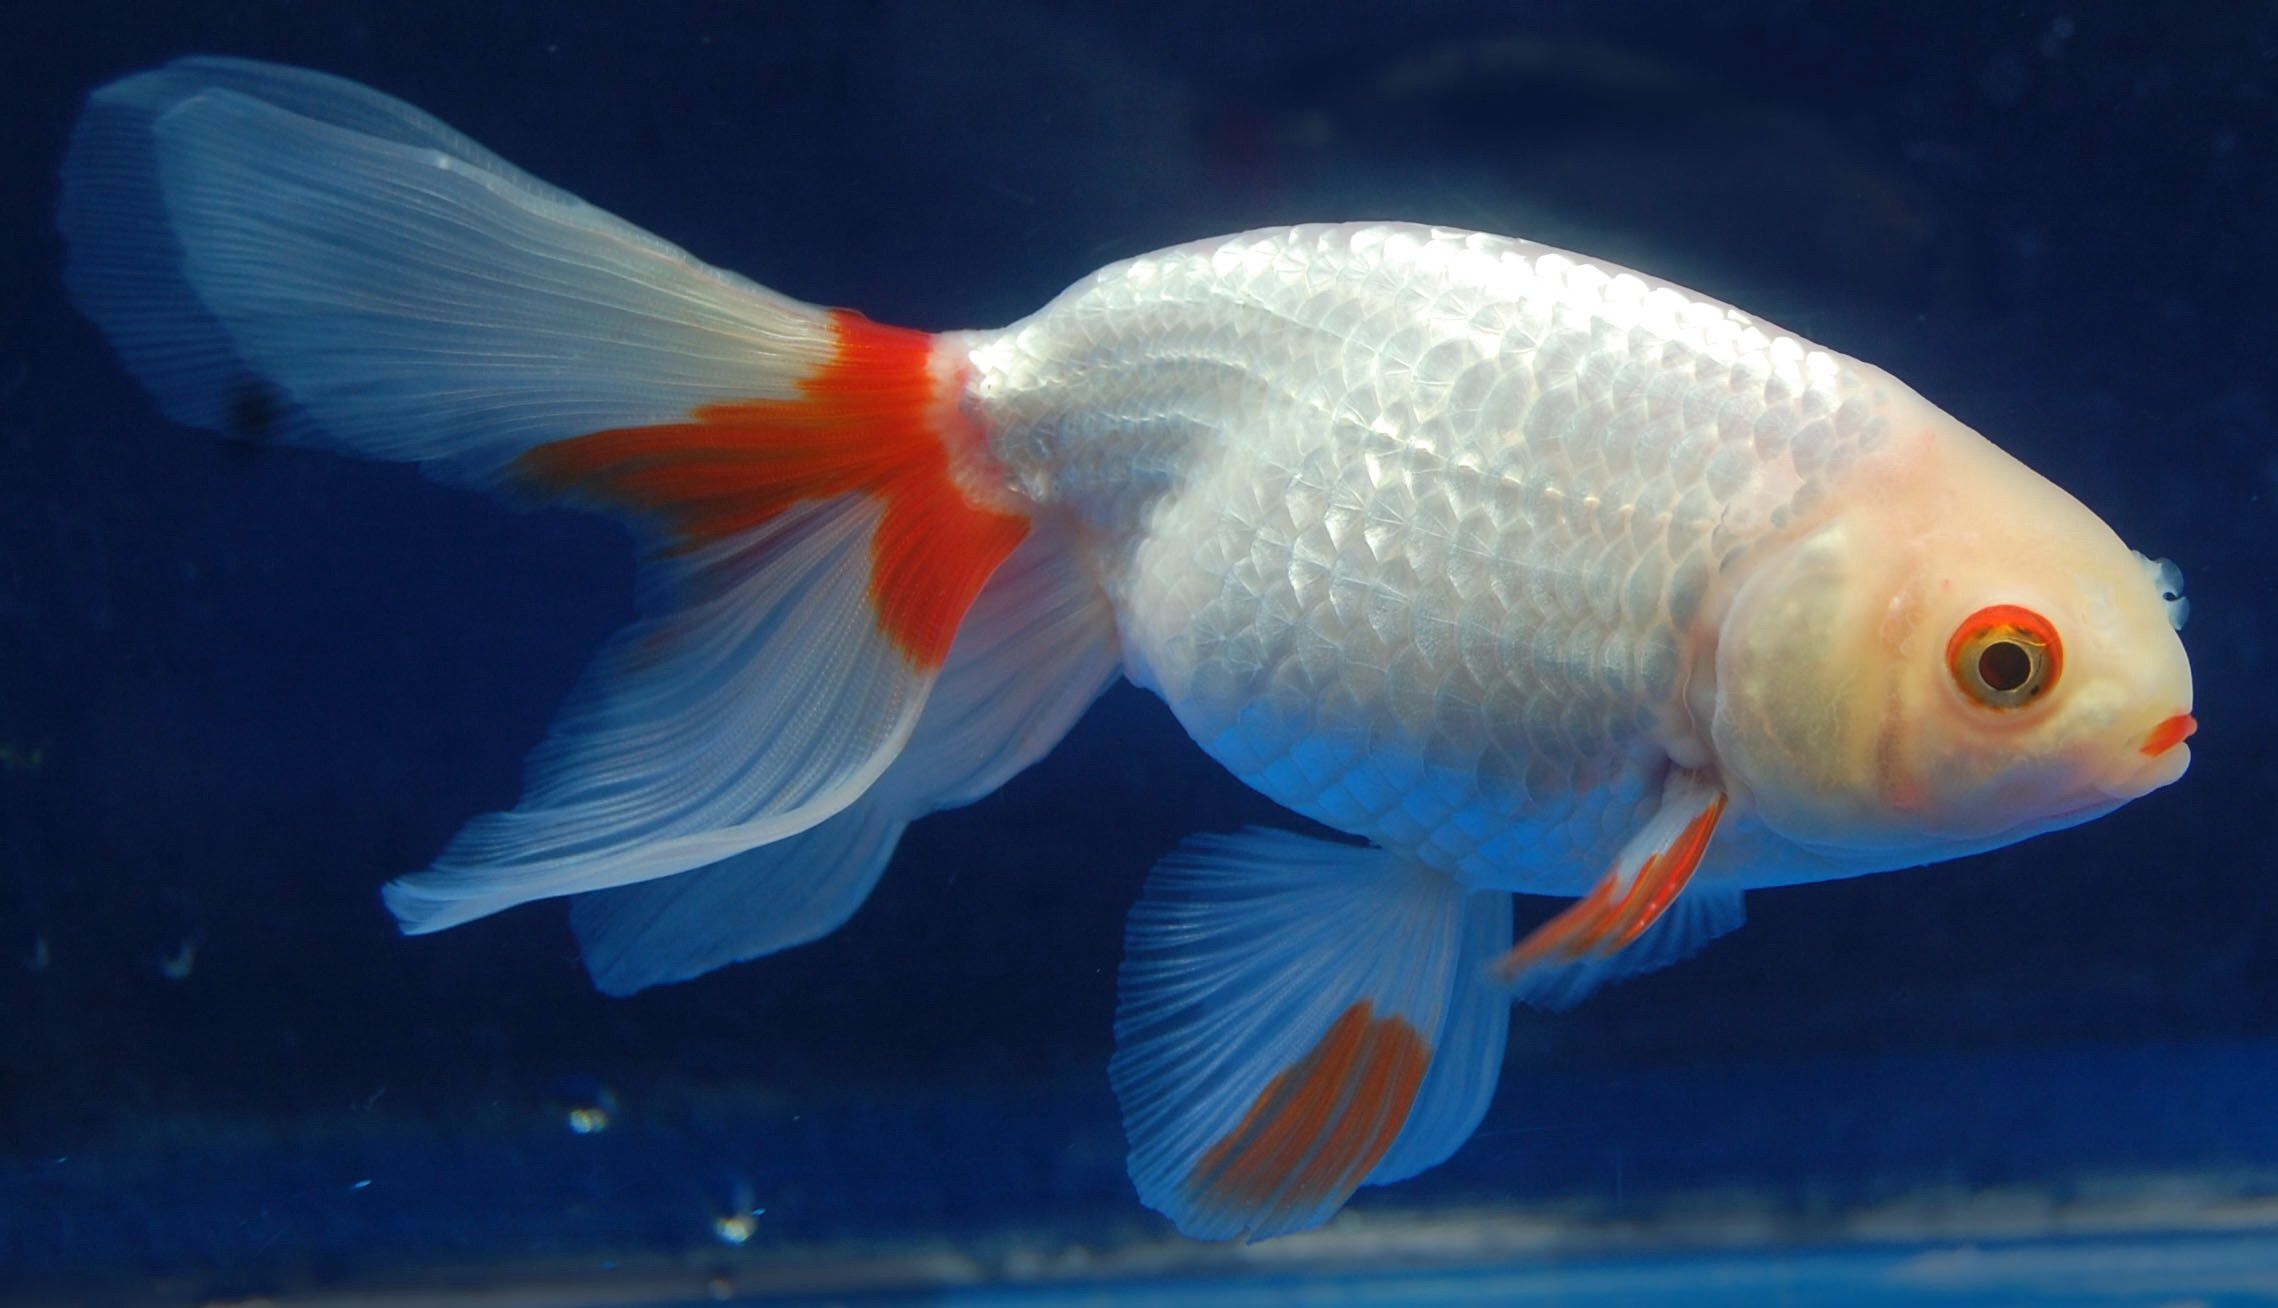 Goldfish Red And White Shukin Goldfish Watercolor Fish Beautiful Fish